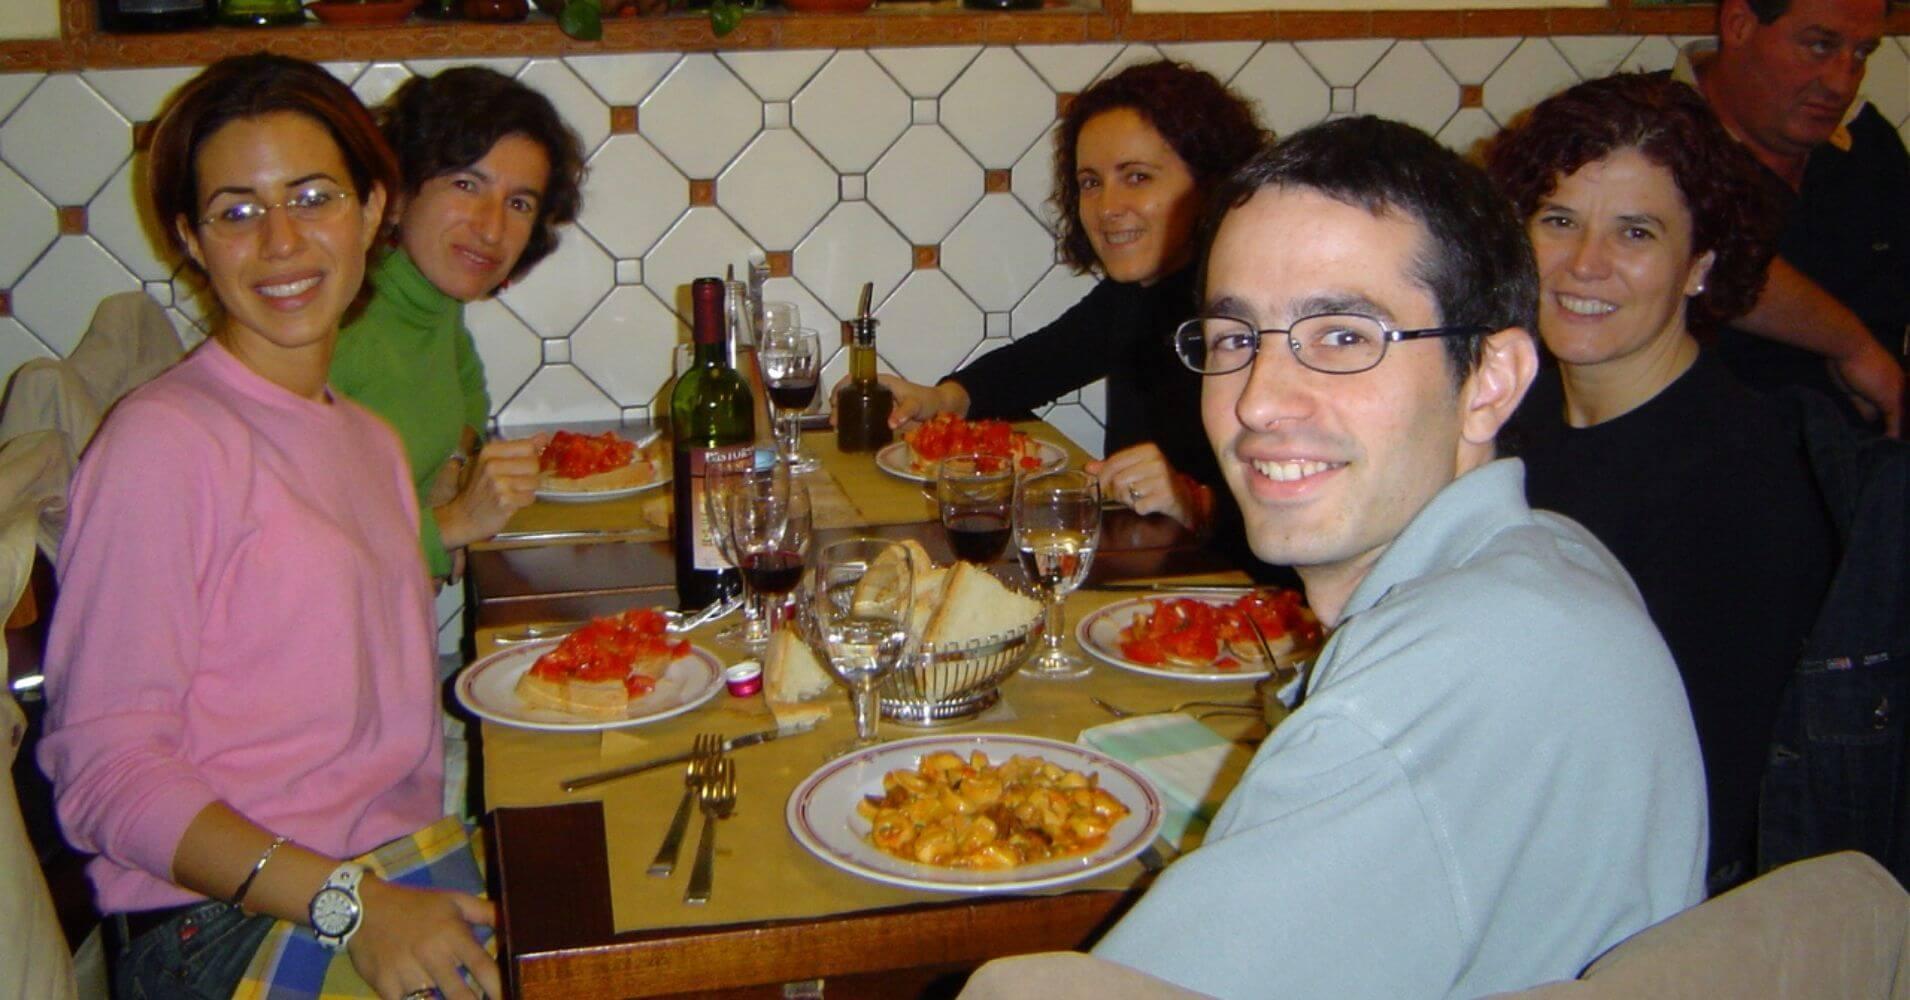 Restaurante la Spada. Florencia. Toscana, Italia.